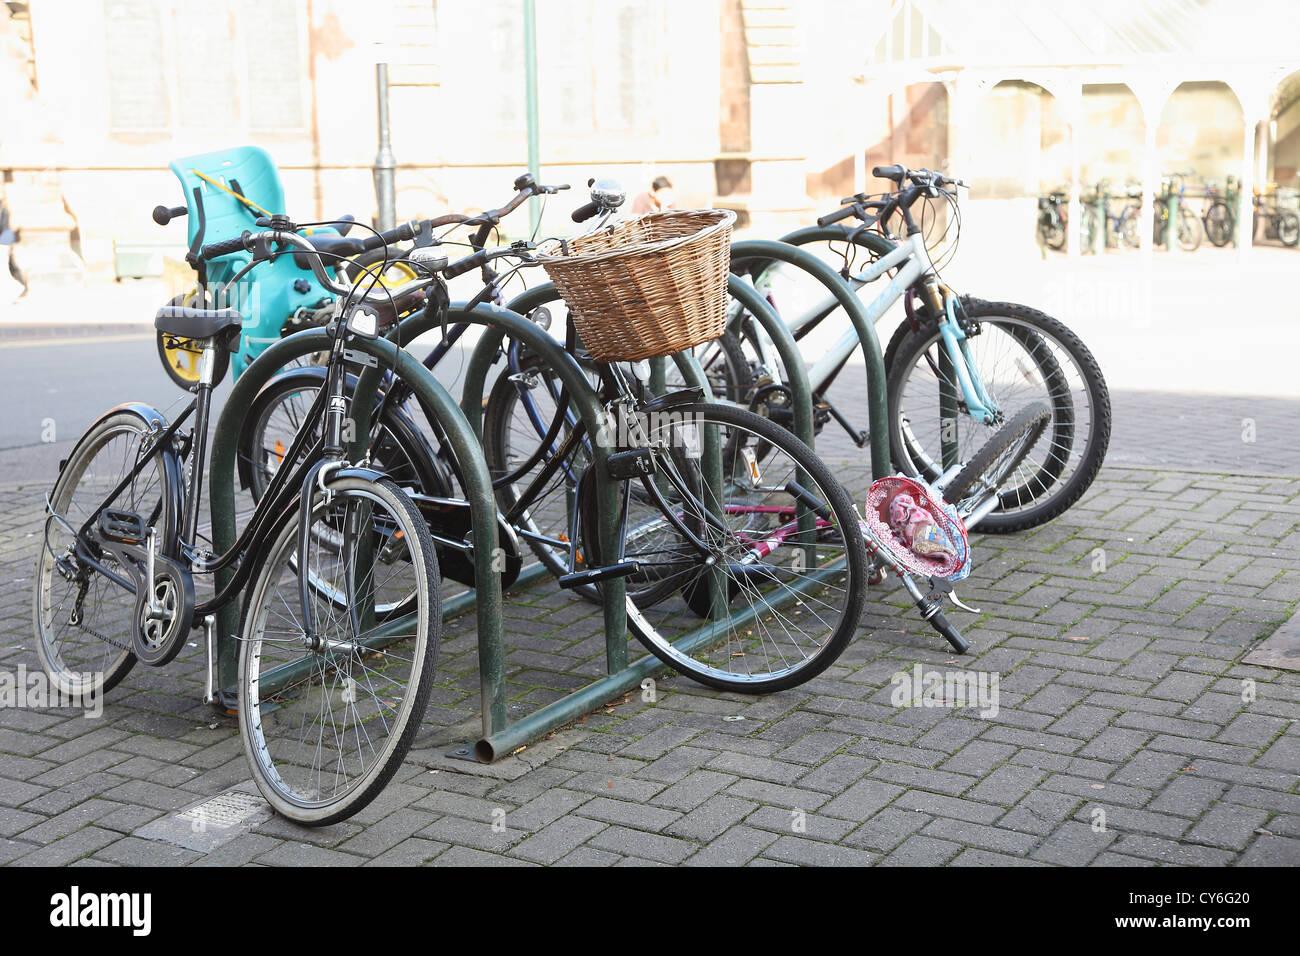 Bike jumble, city centre bike parking - Stock Image